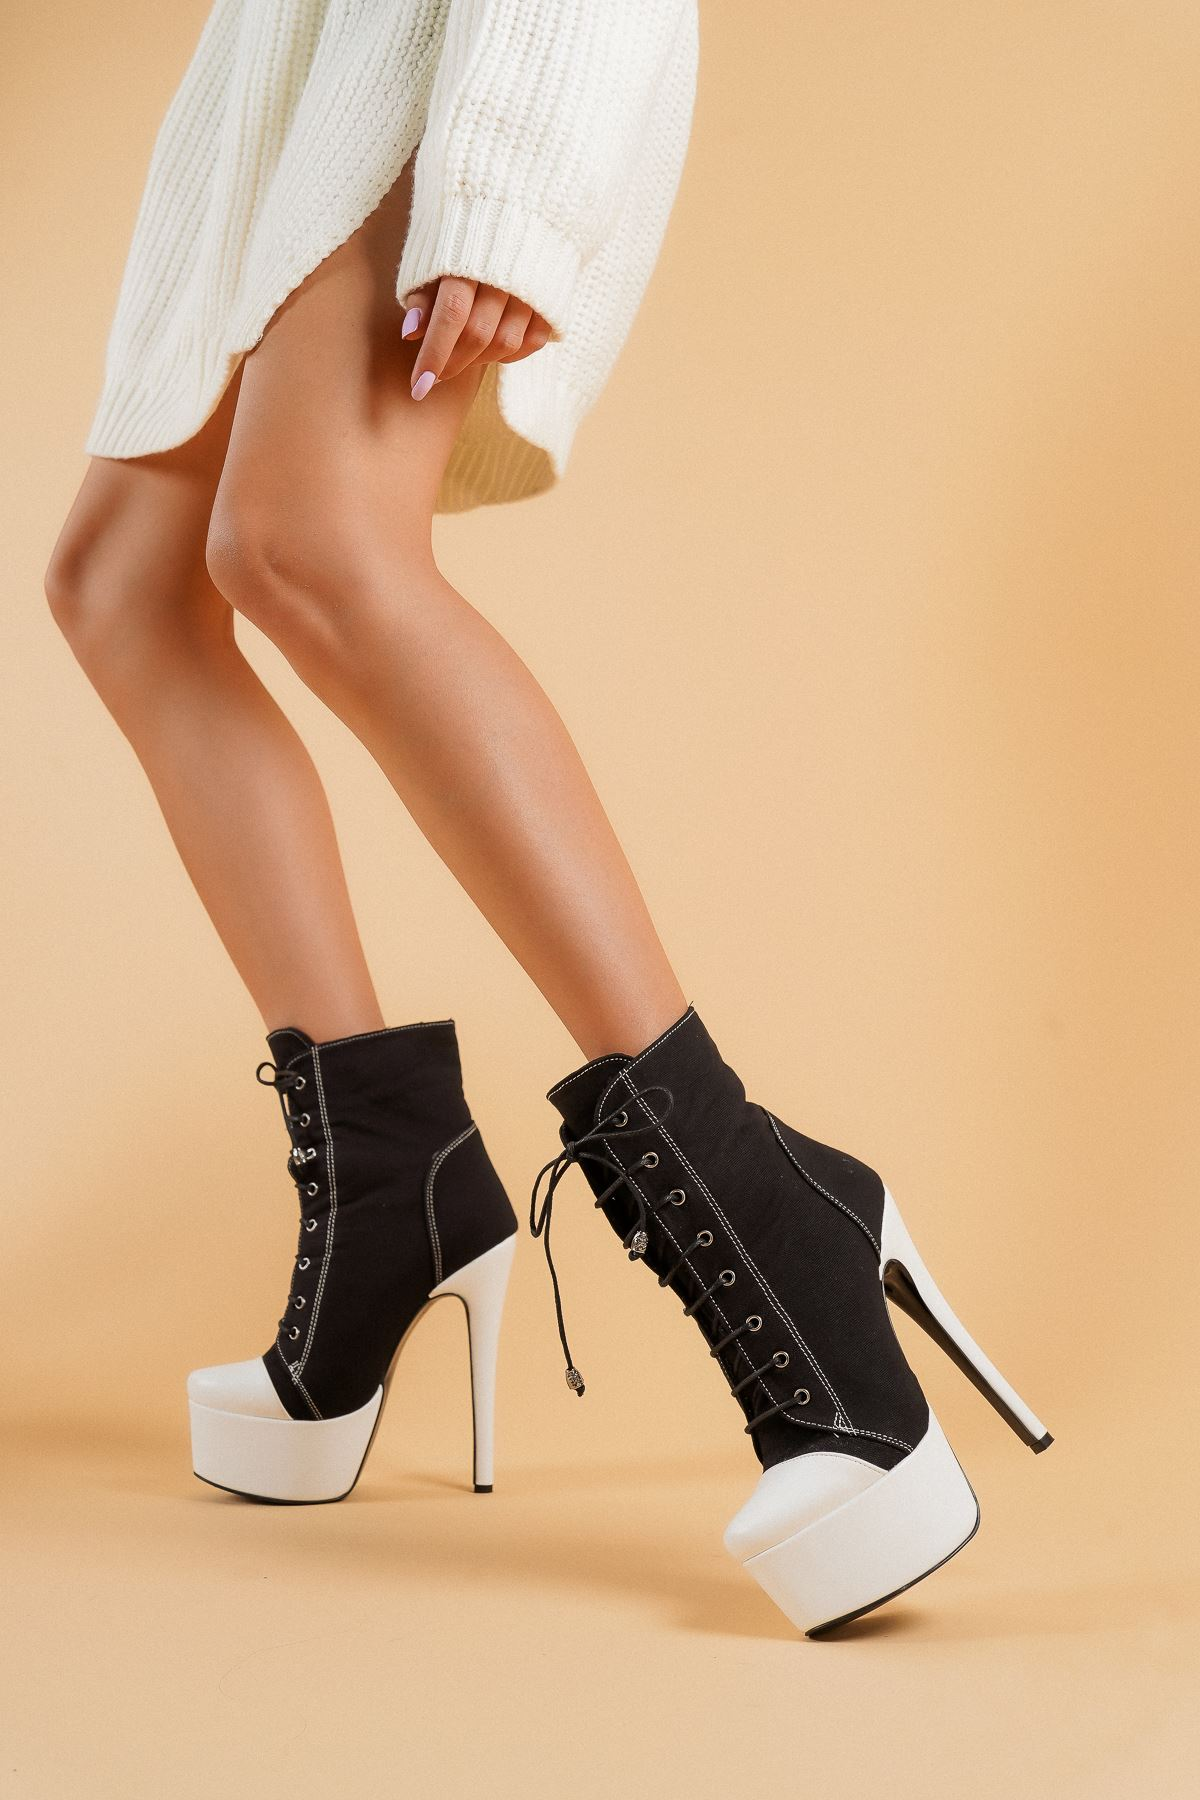 AllStar Siyah Keten Beyaz Cilt Topuklu Kadın Bot